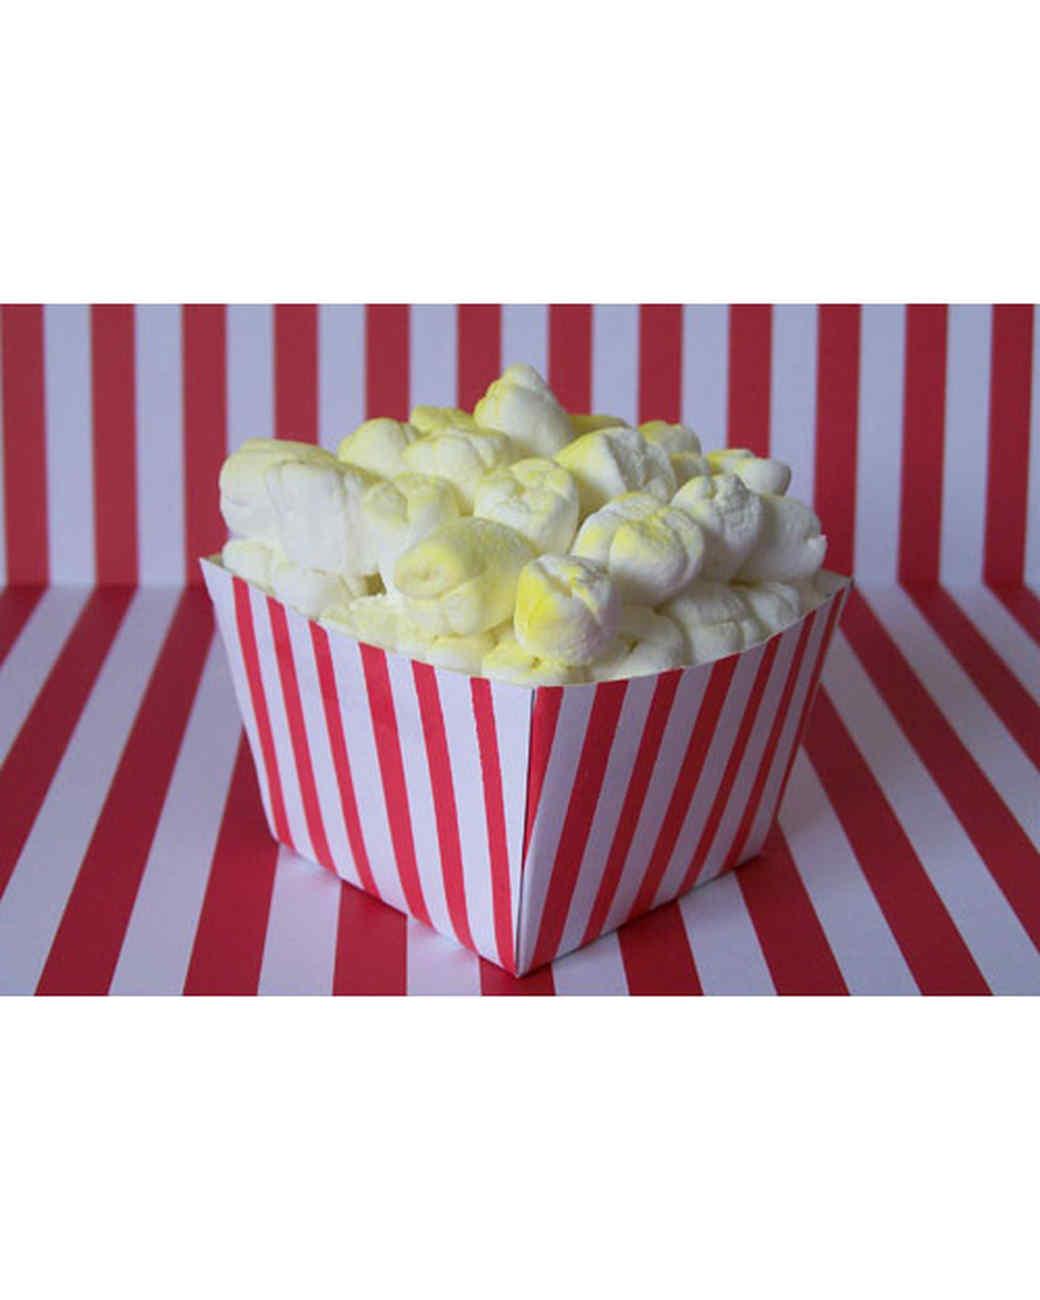 cupcake_contest_0211_popcorn_cupcake.jpg